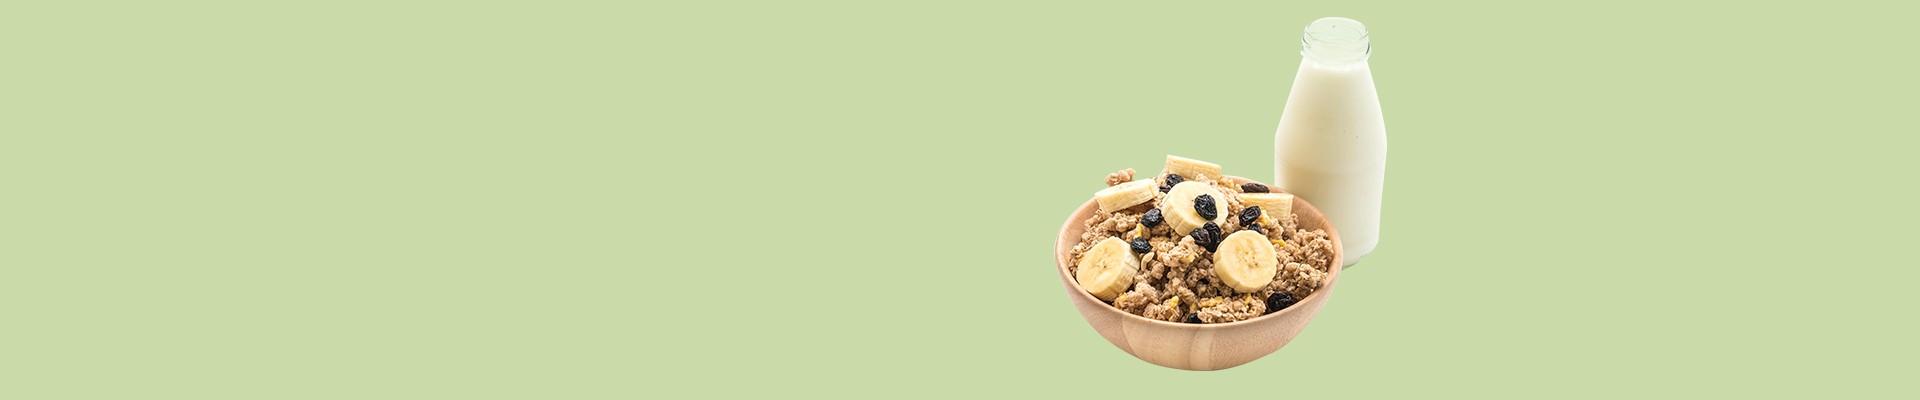 Jual Makanan & Minuman Kesehatan - Harga Grosir